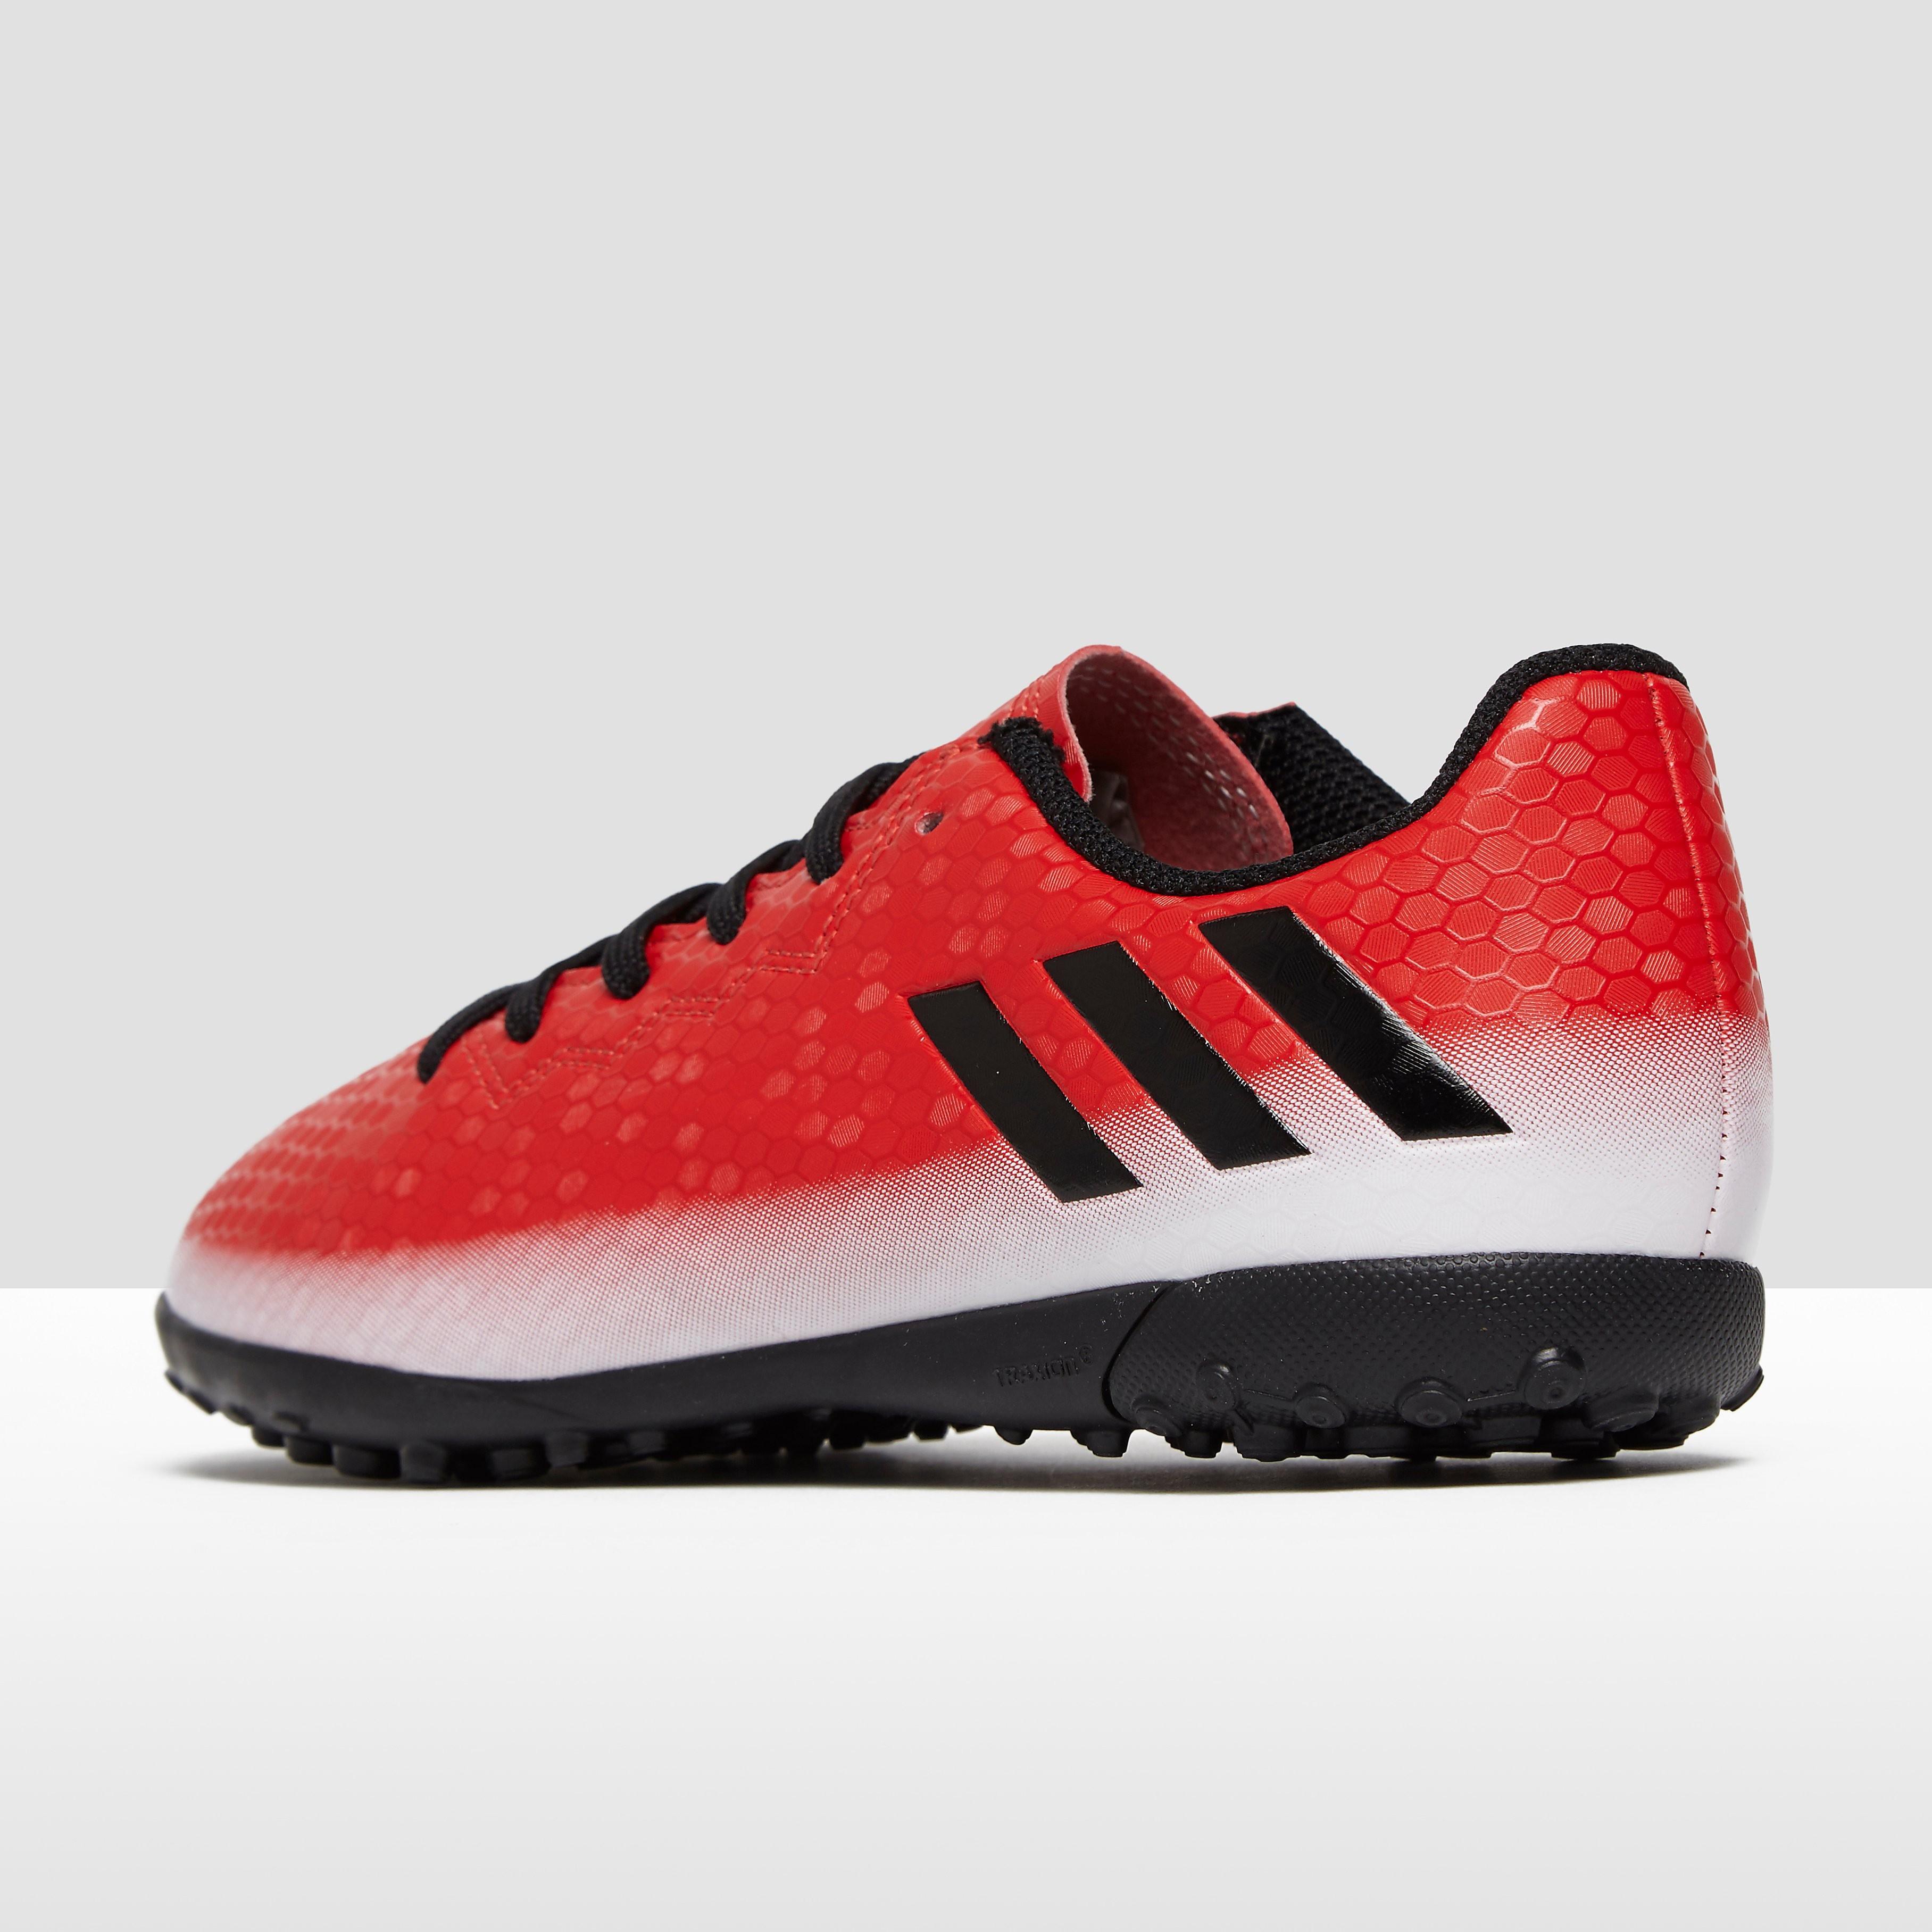 adidas Children's Messi 16.4 Turf Football Boots